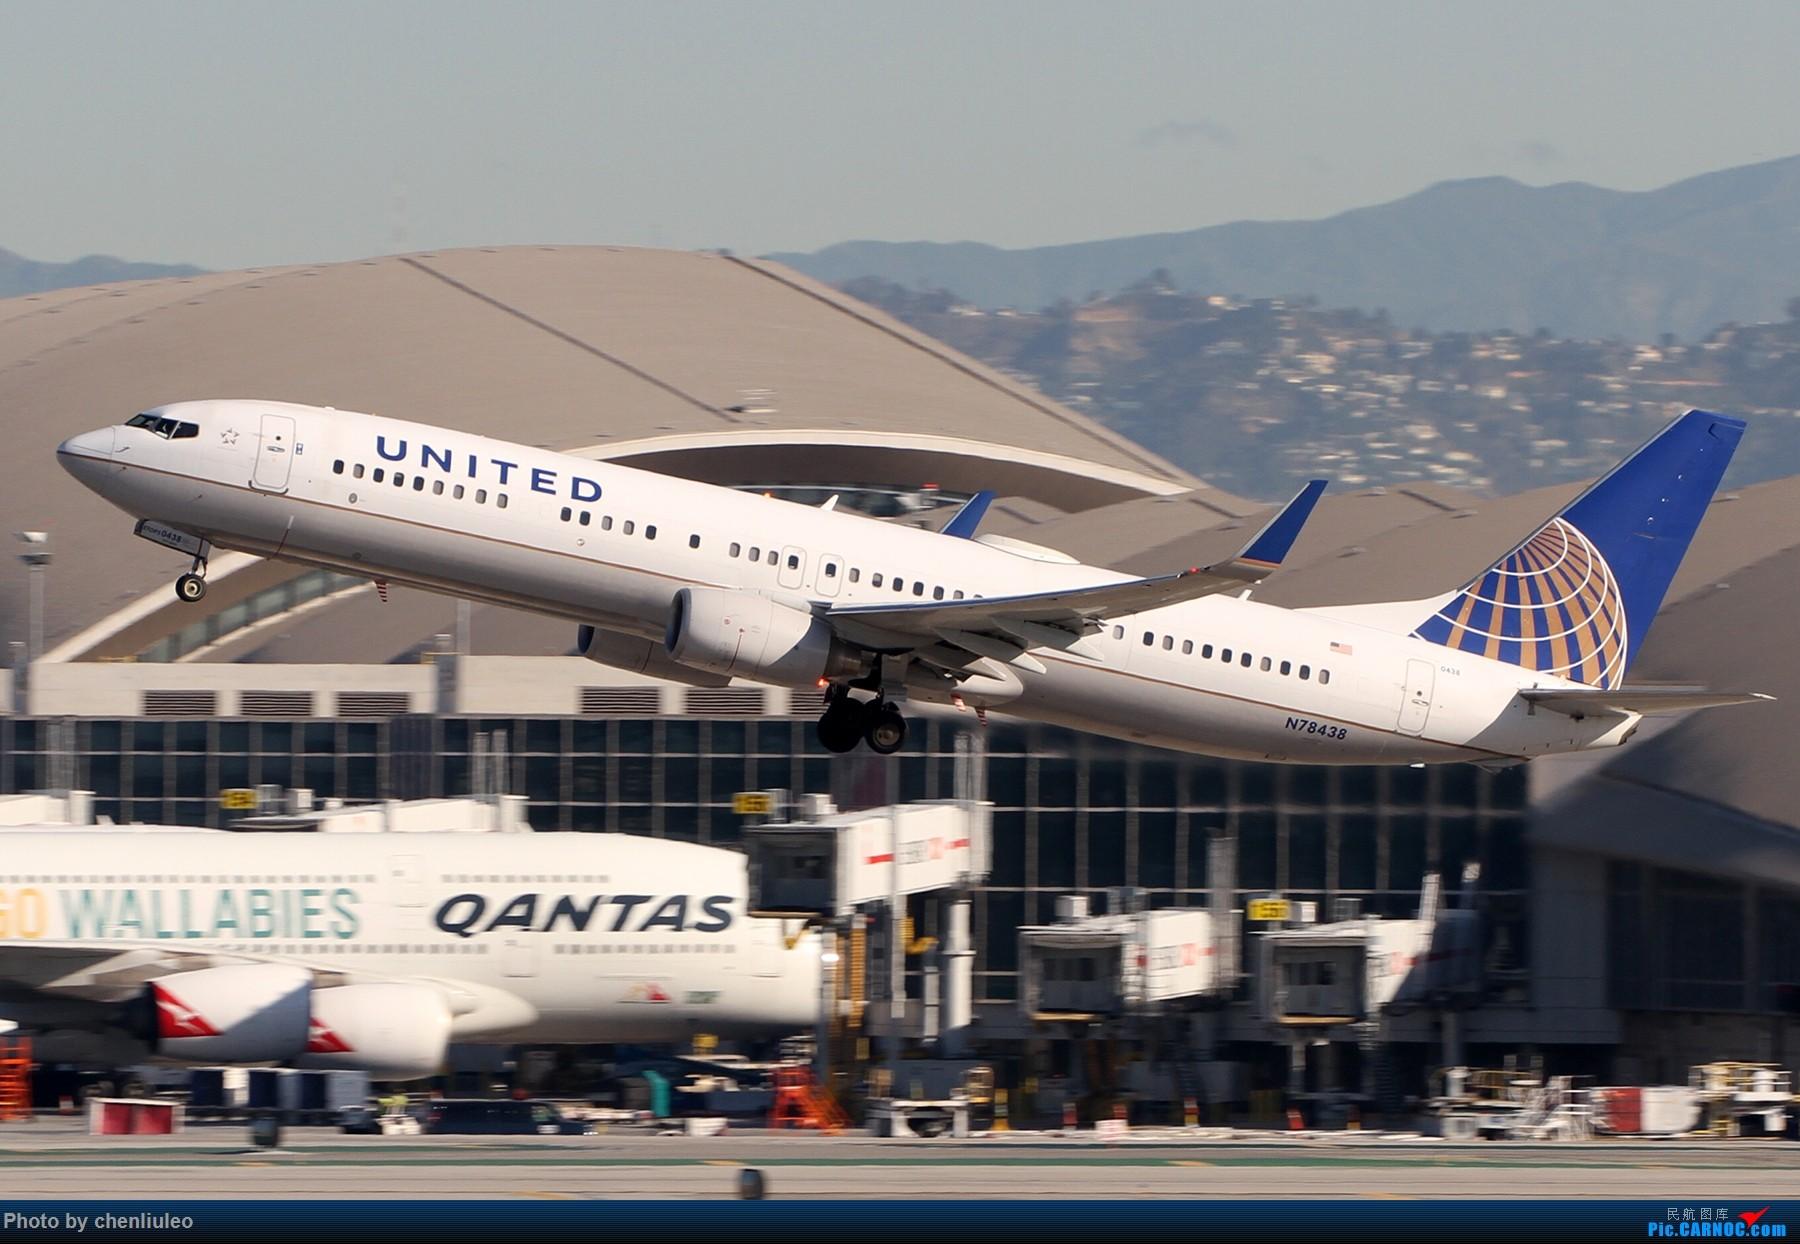 Re:[原创]【北美飞友会】LAX带地景起飞一组 BOEING 737-900ER N78438 美国洛杉矶机场